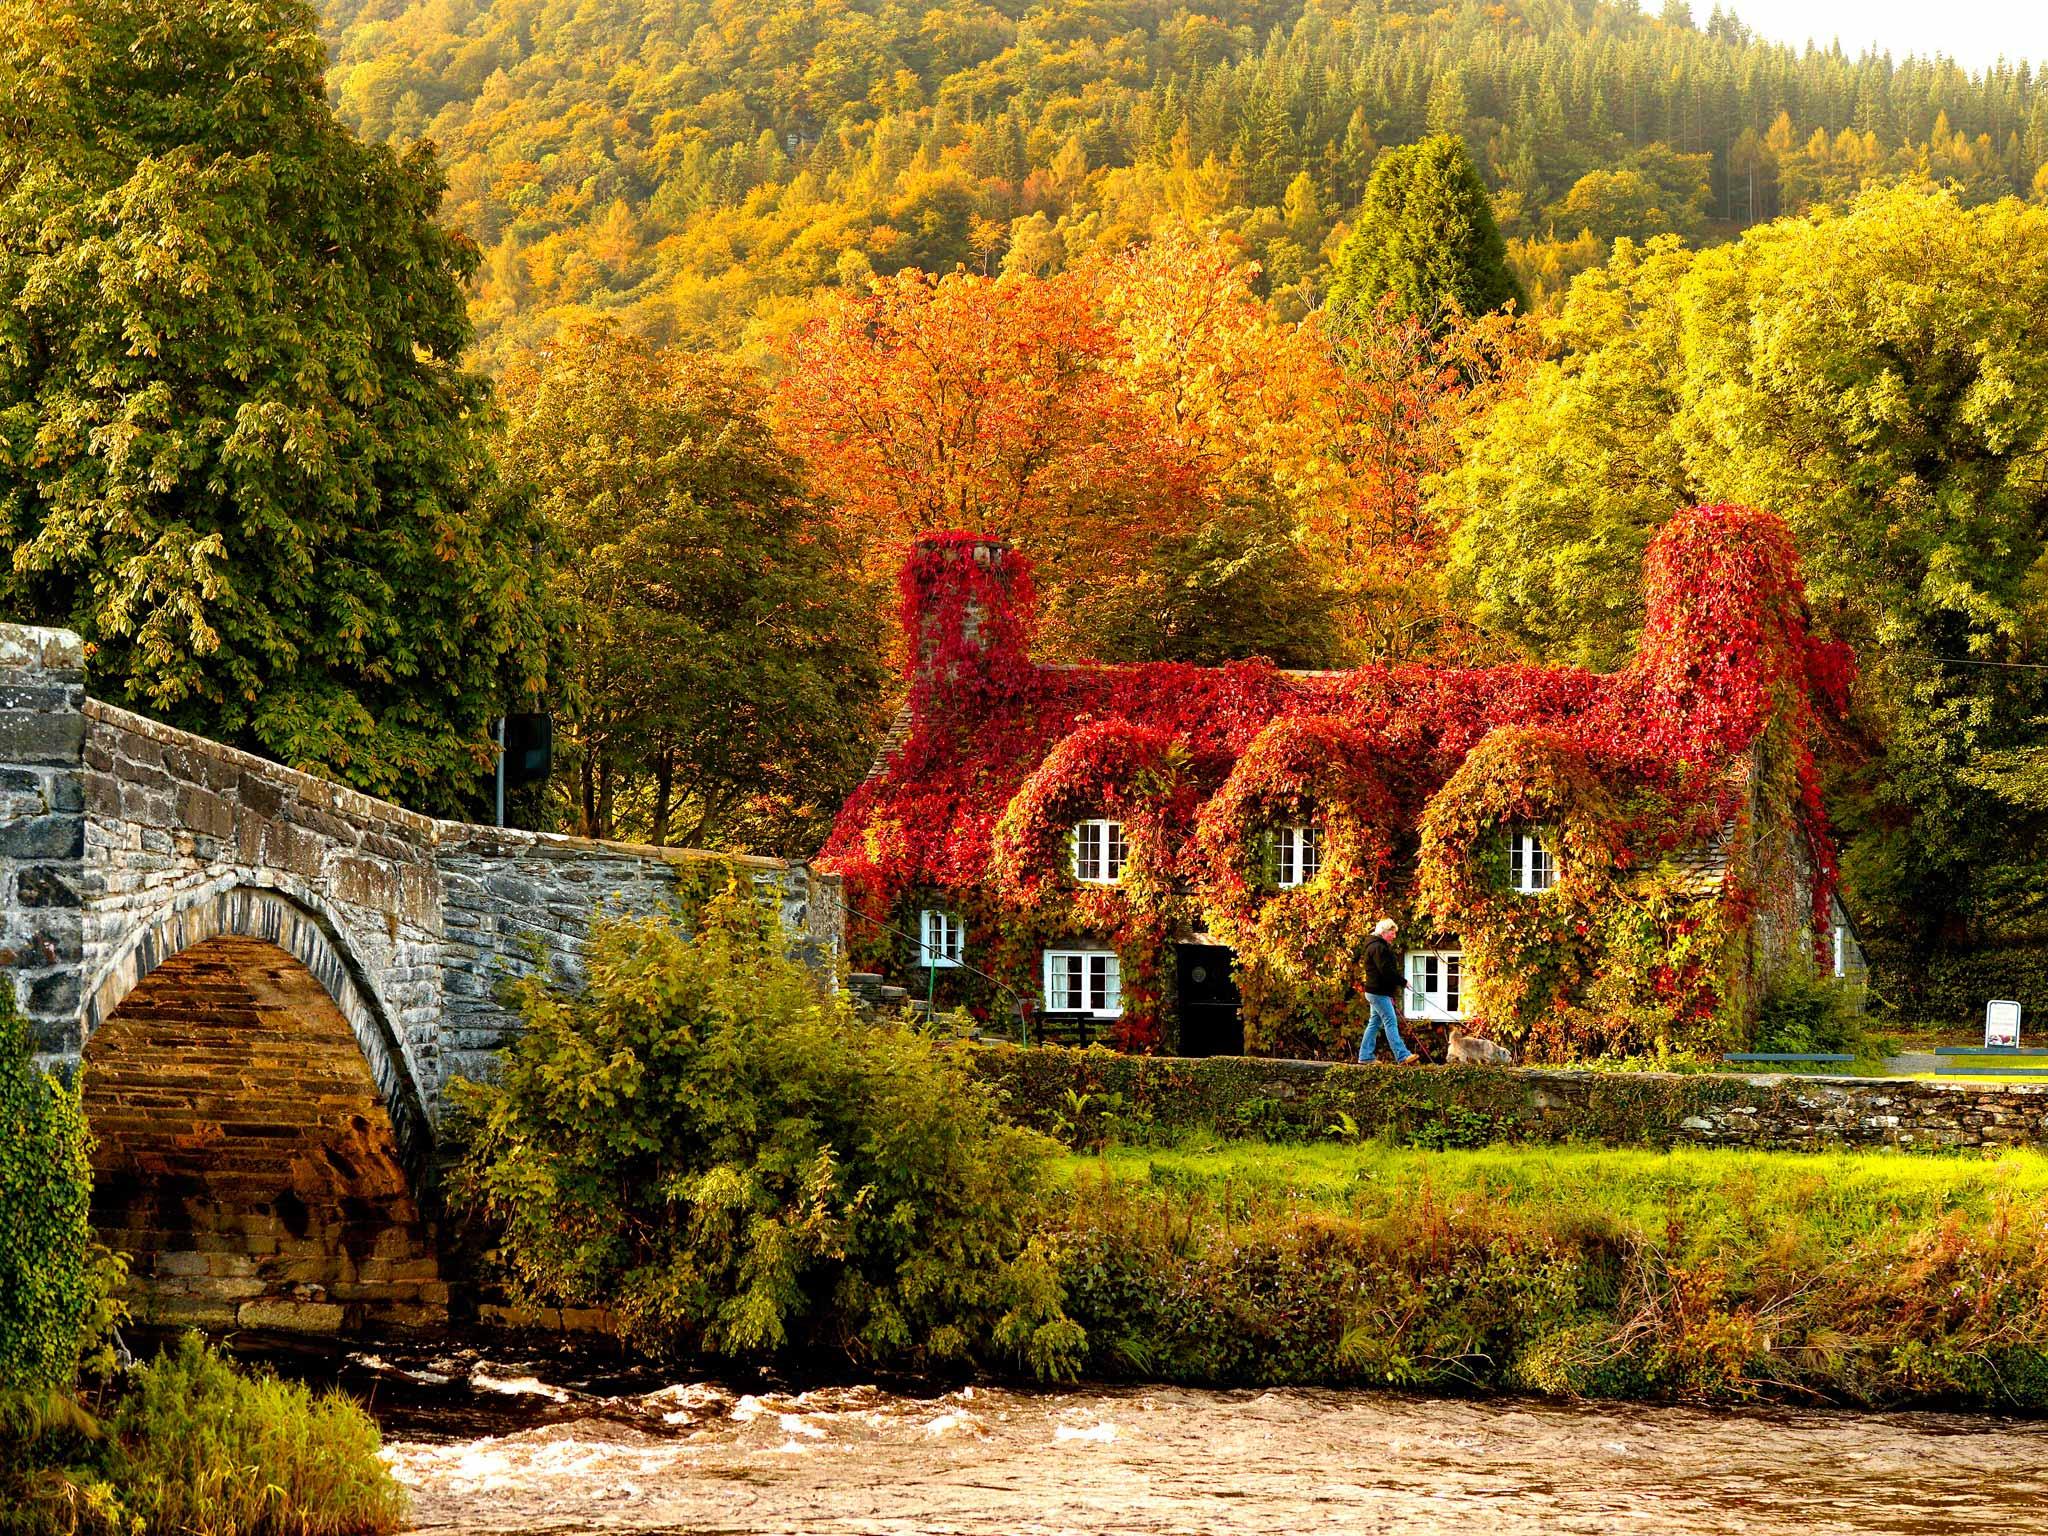 Autumn-colours-surround-t-009.jpg (JPEG Image, 2048×1536 pixels) - Scaled (50%)